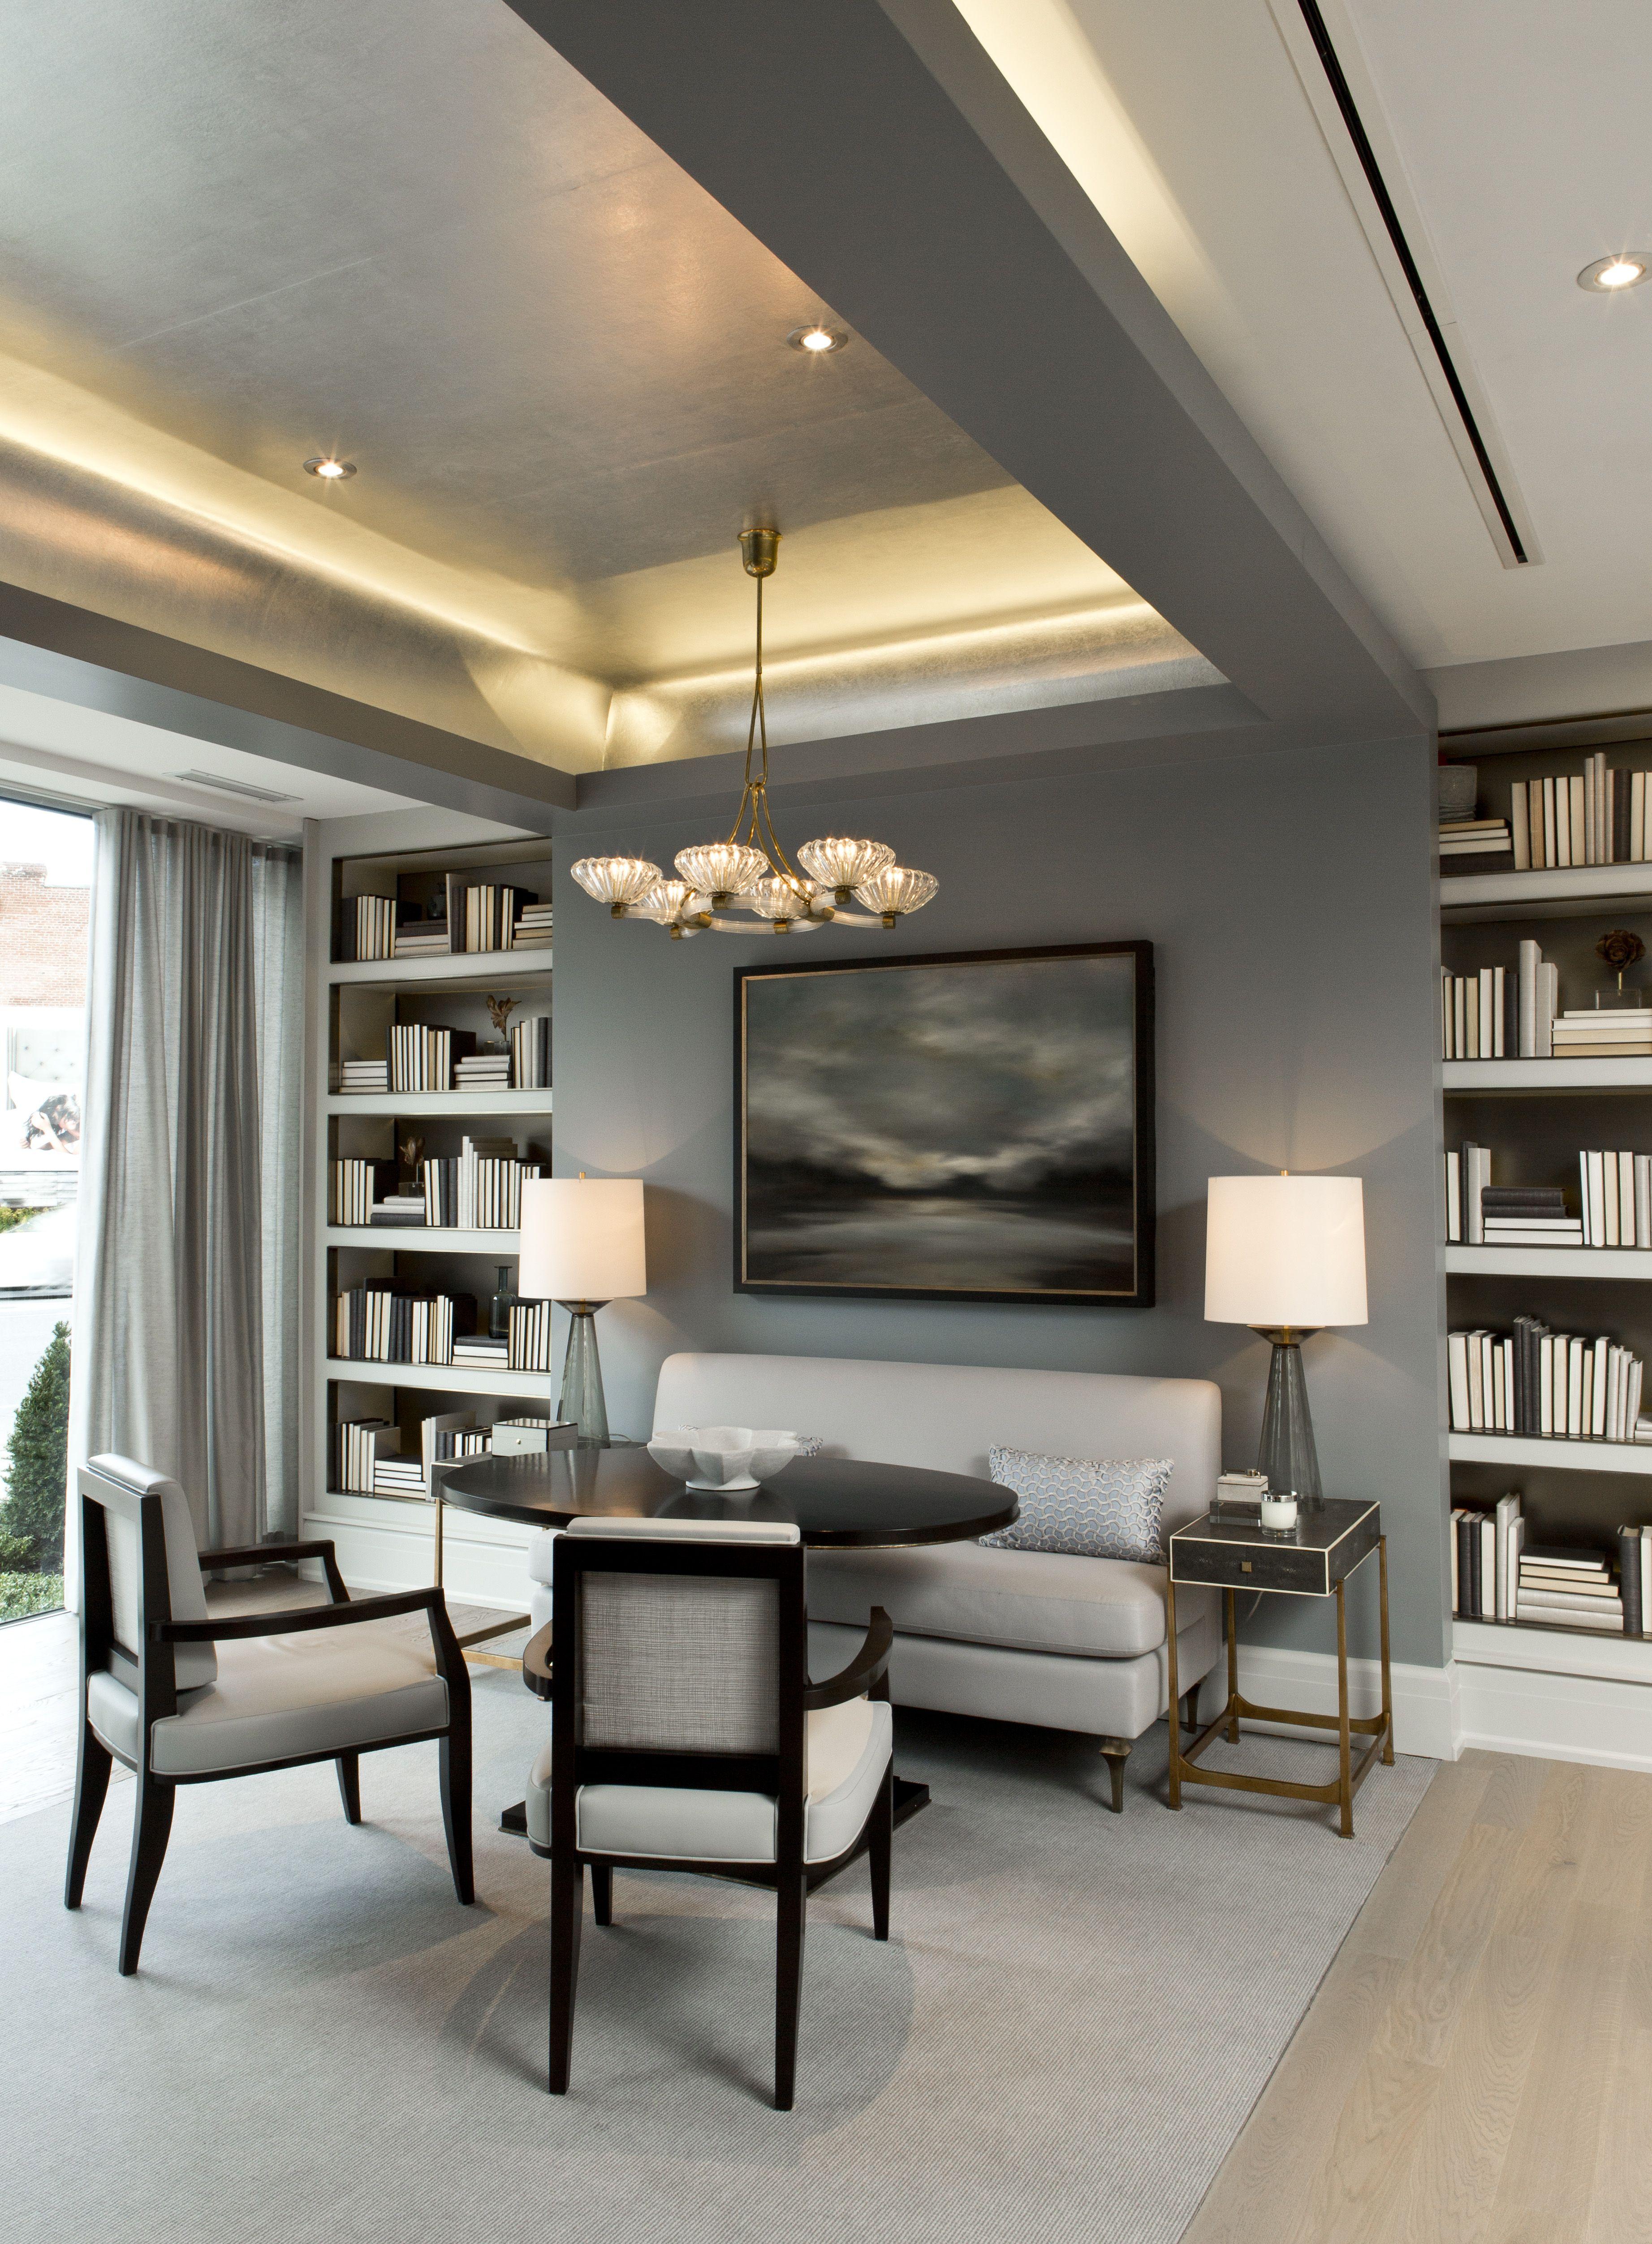 181 Davenport Modern Classic Interior Neoclassical